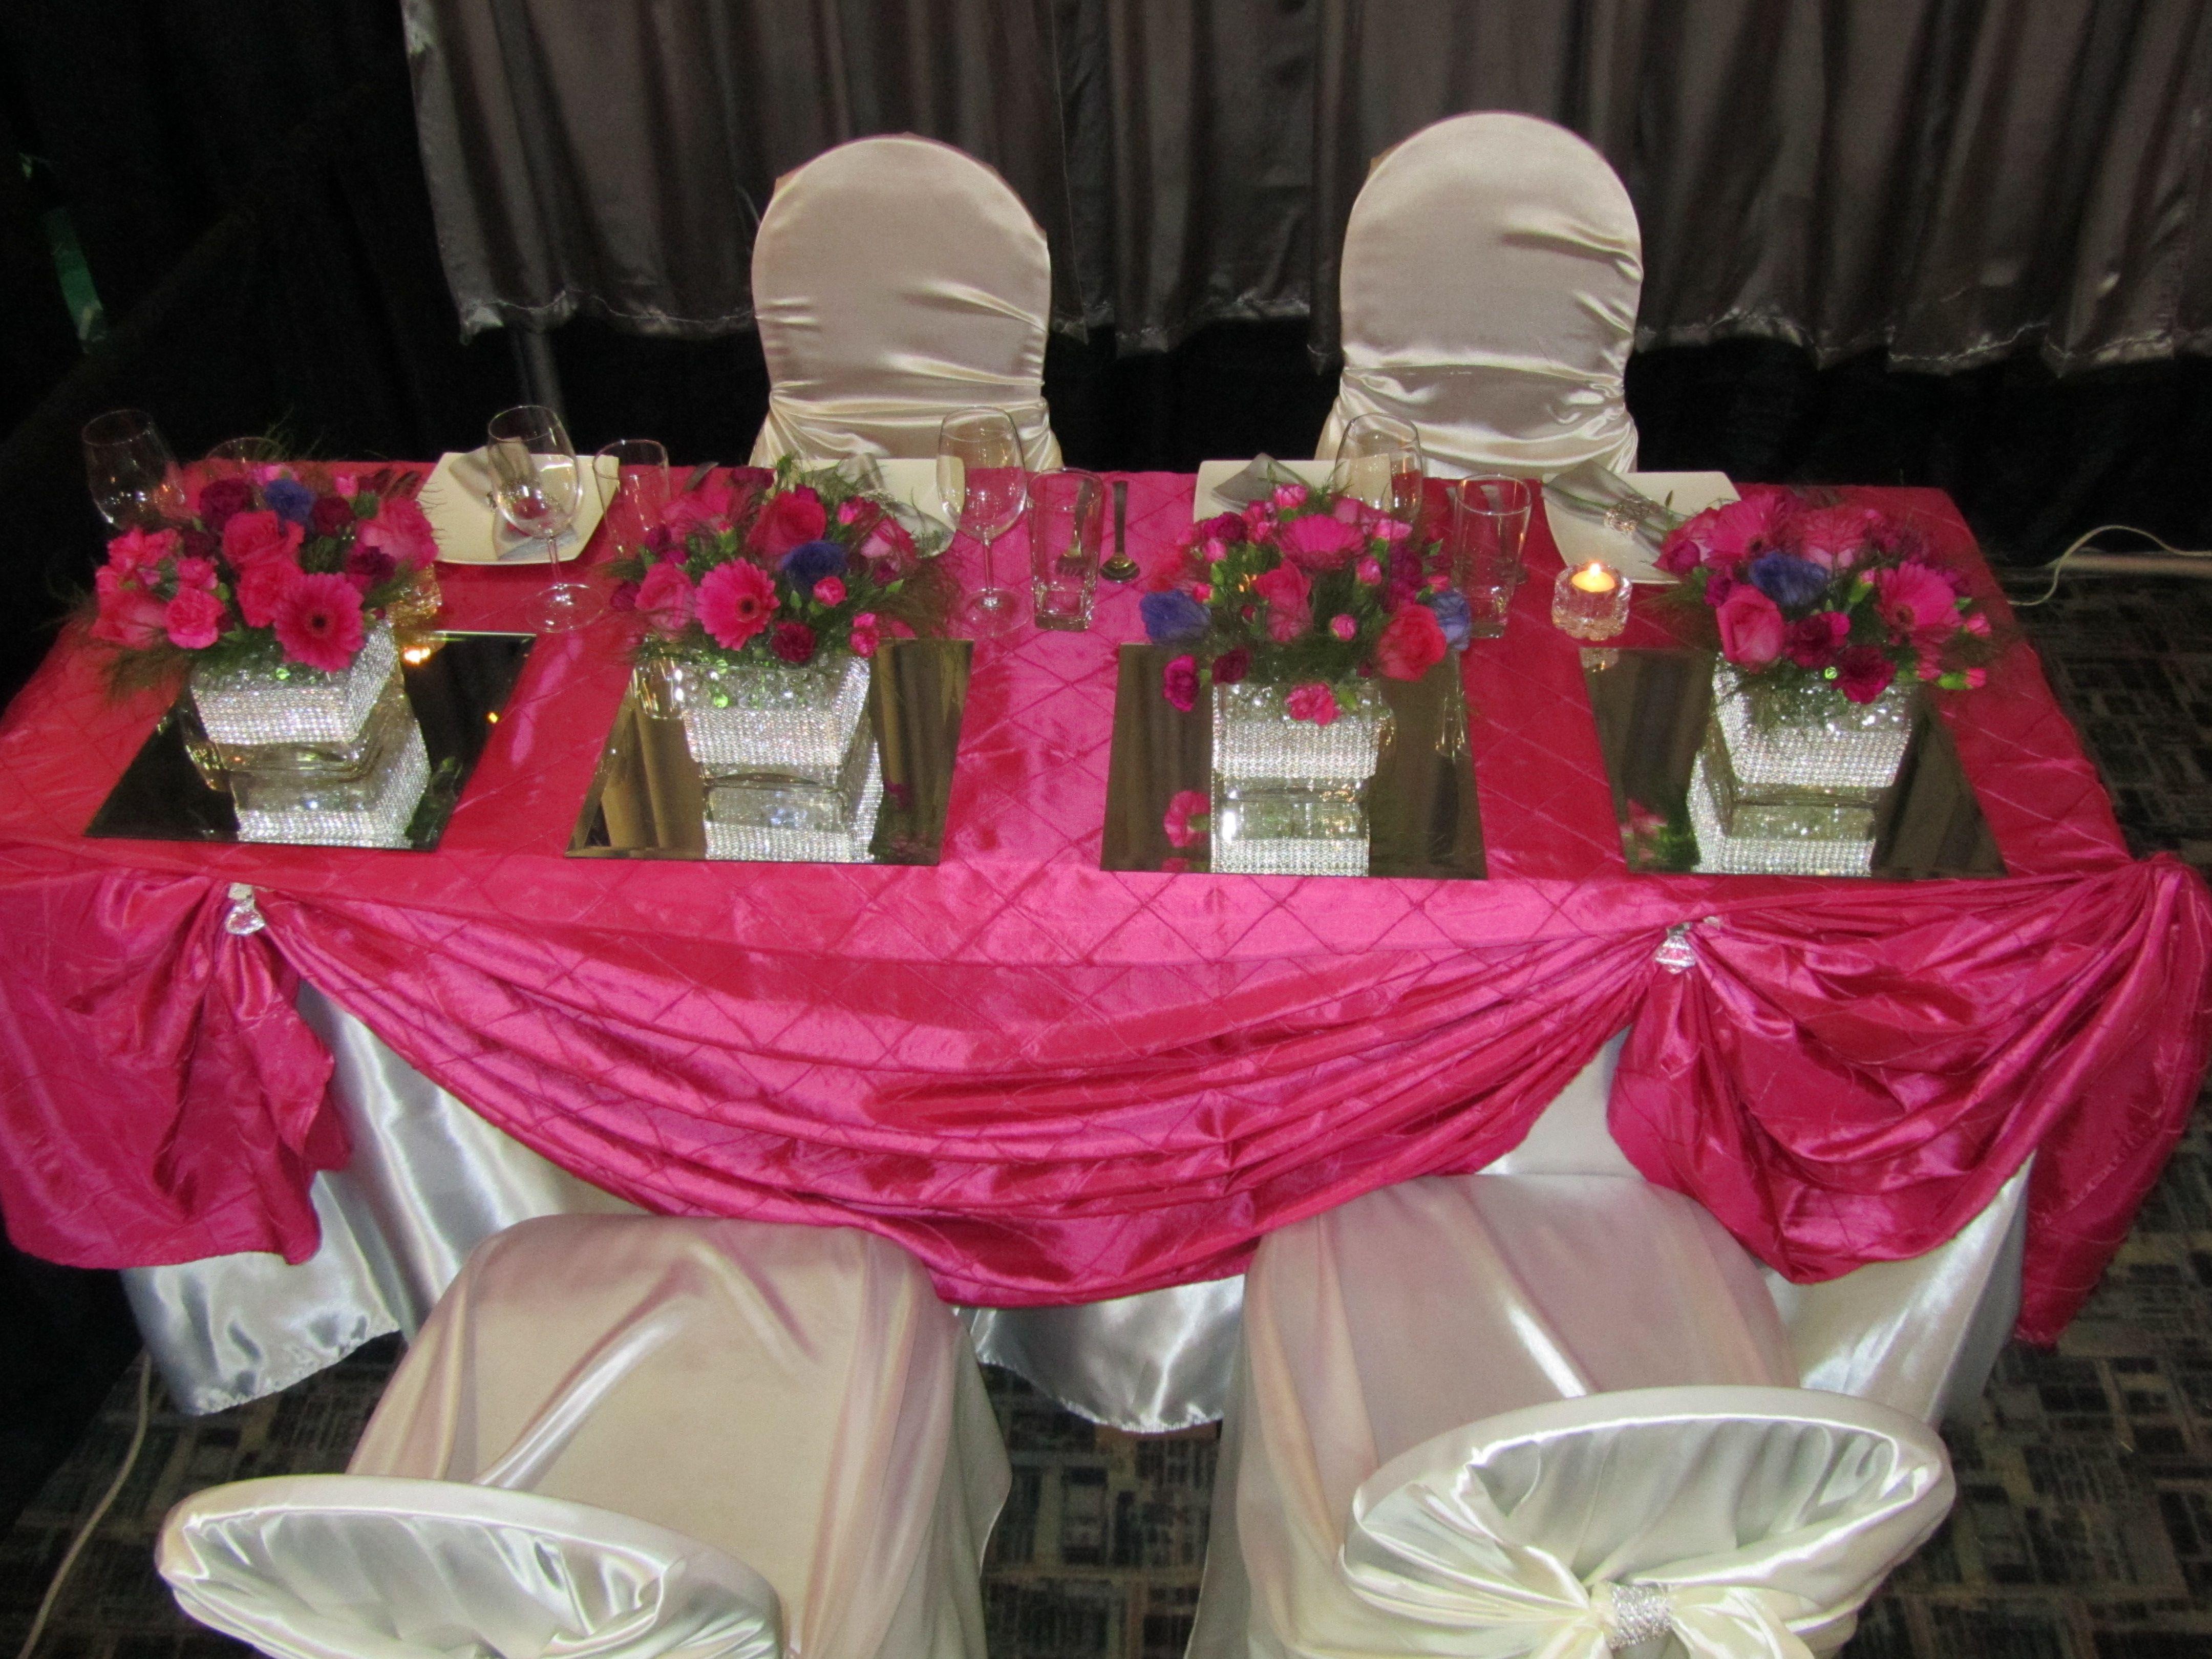 Sample Head Table Decor Fushia Pintuck tablecloth cloth with